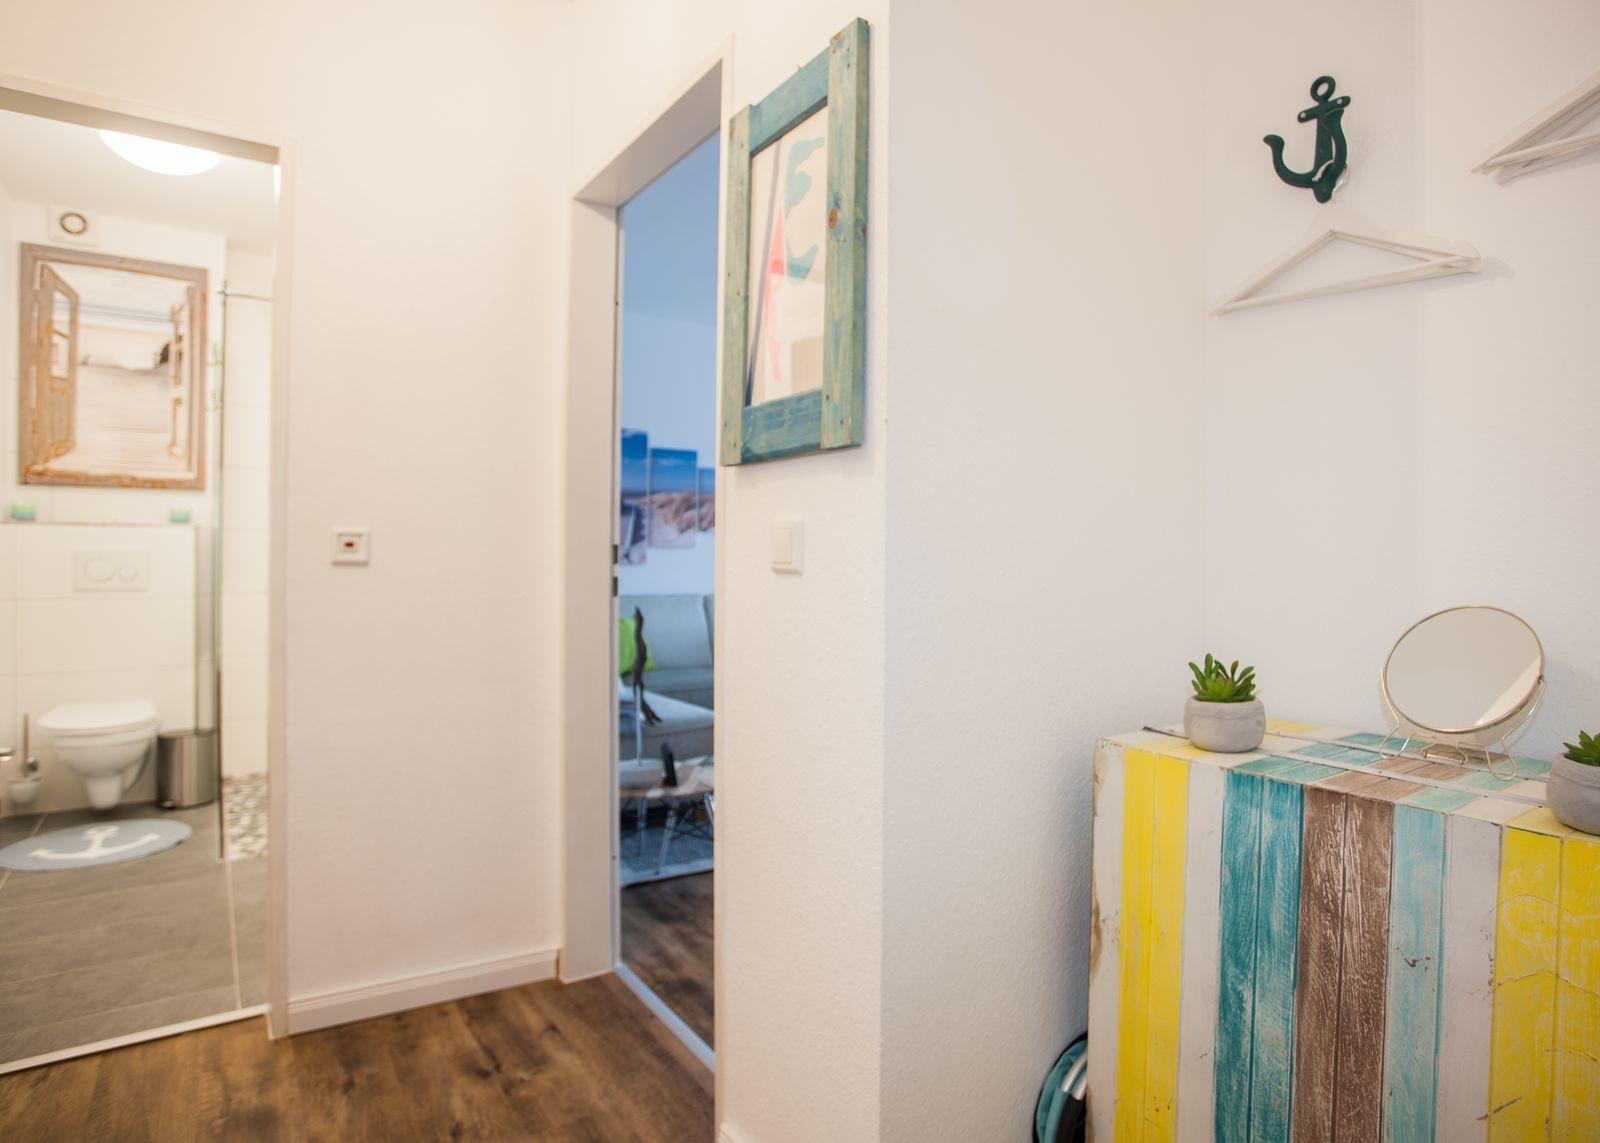 Apartment - Am Bergelchen 58-J